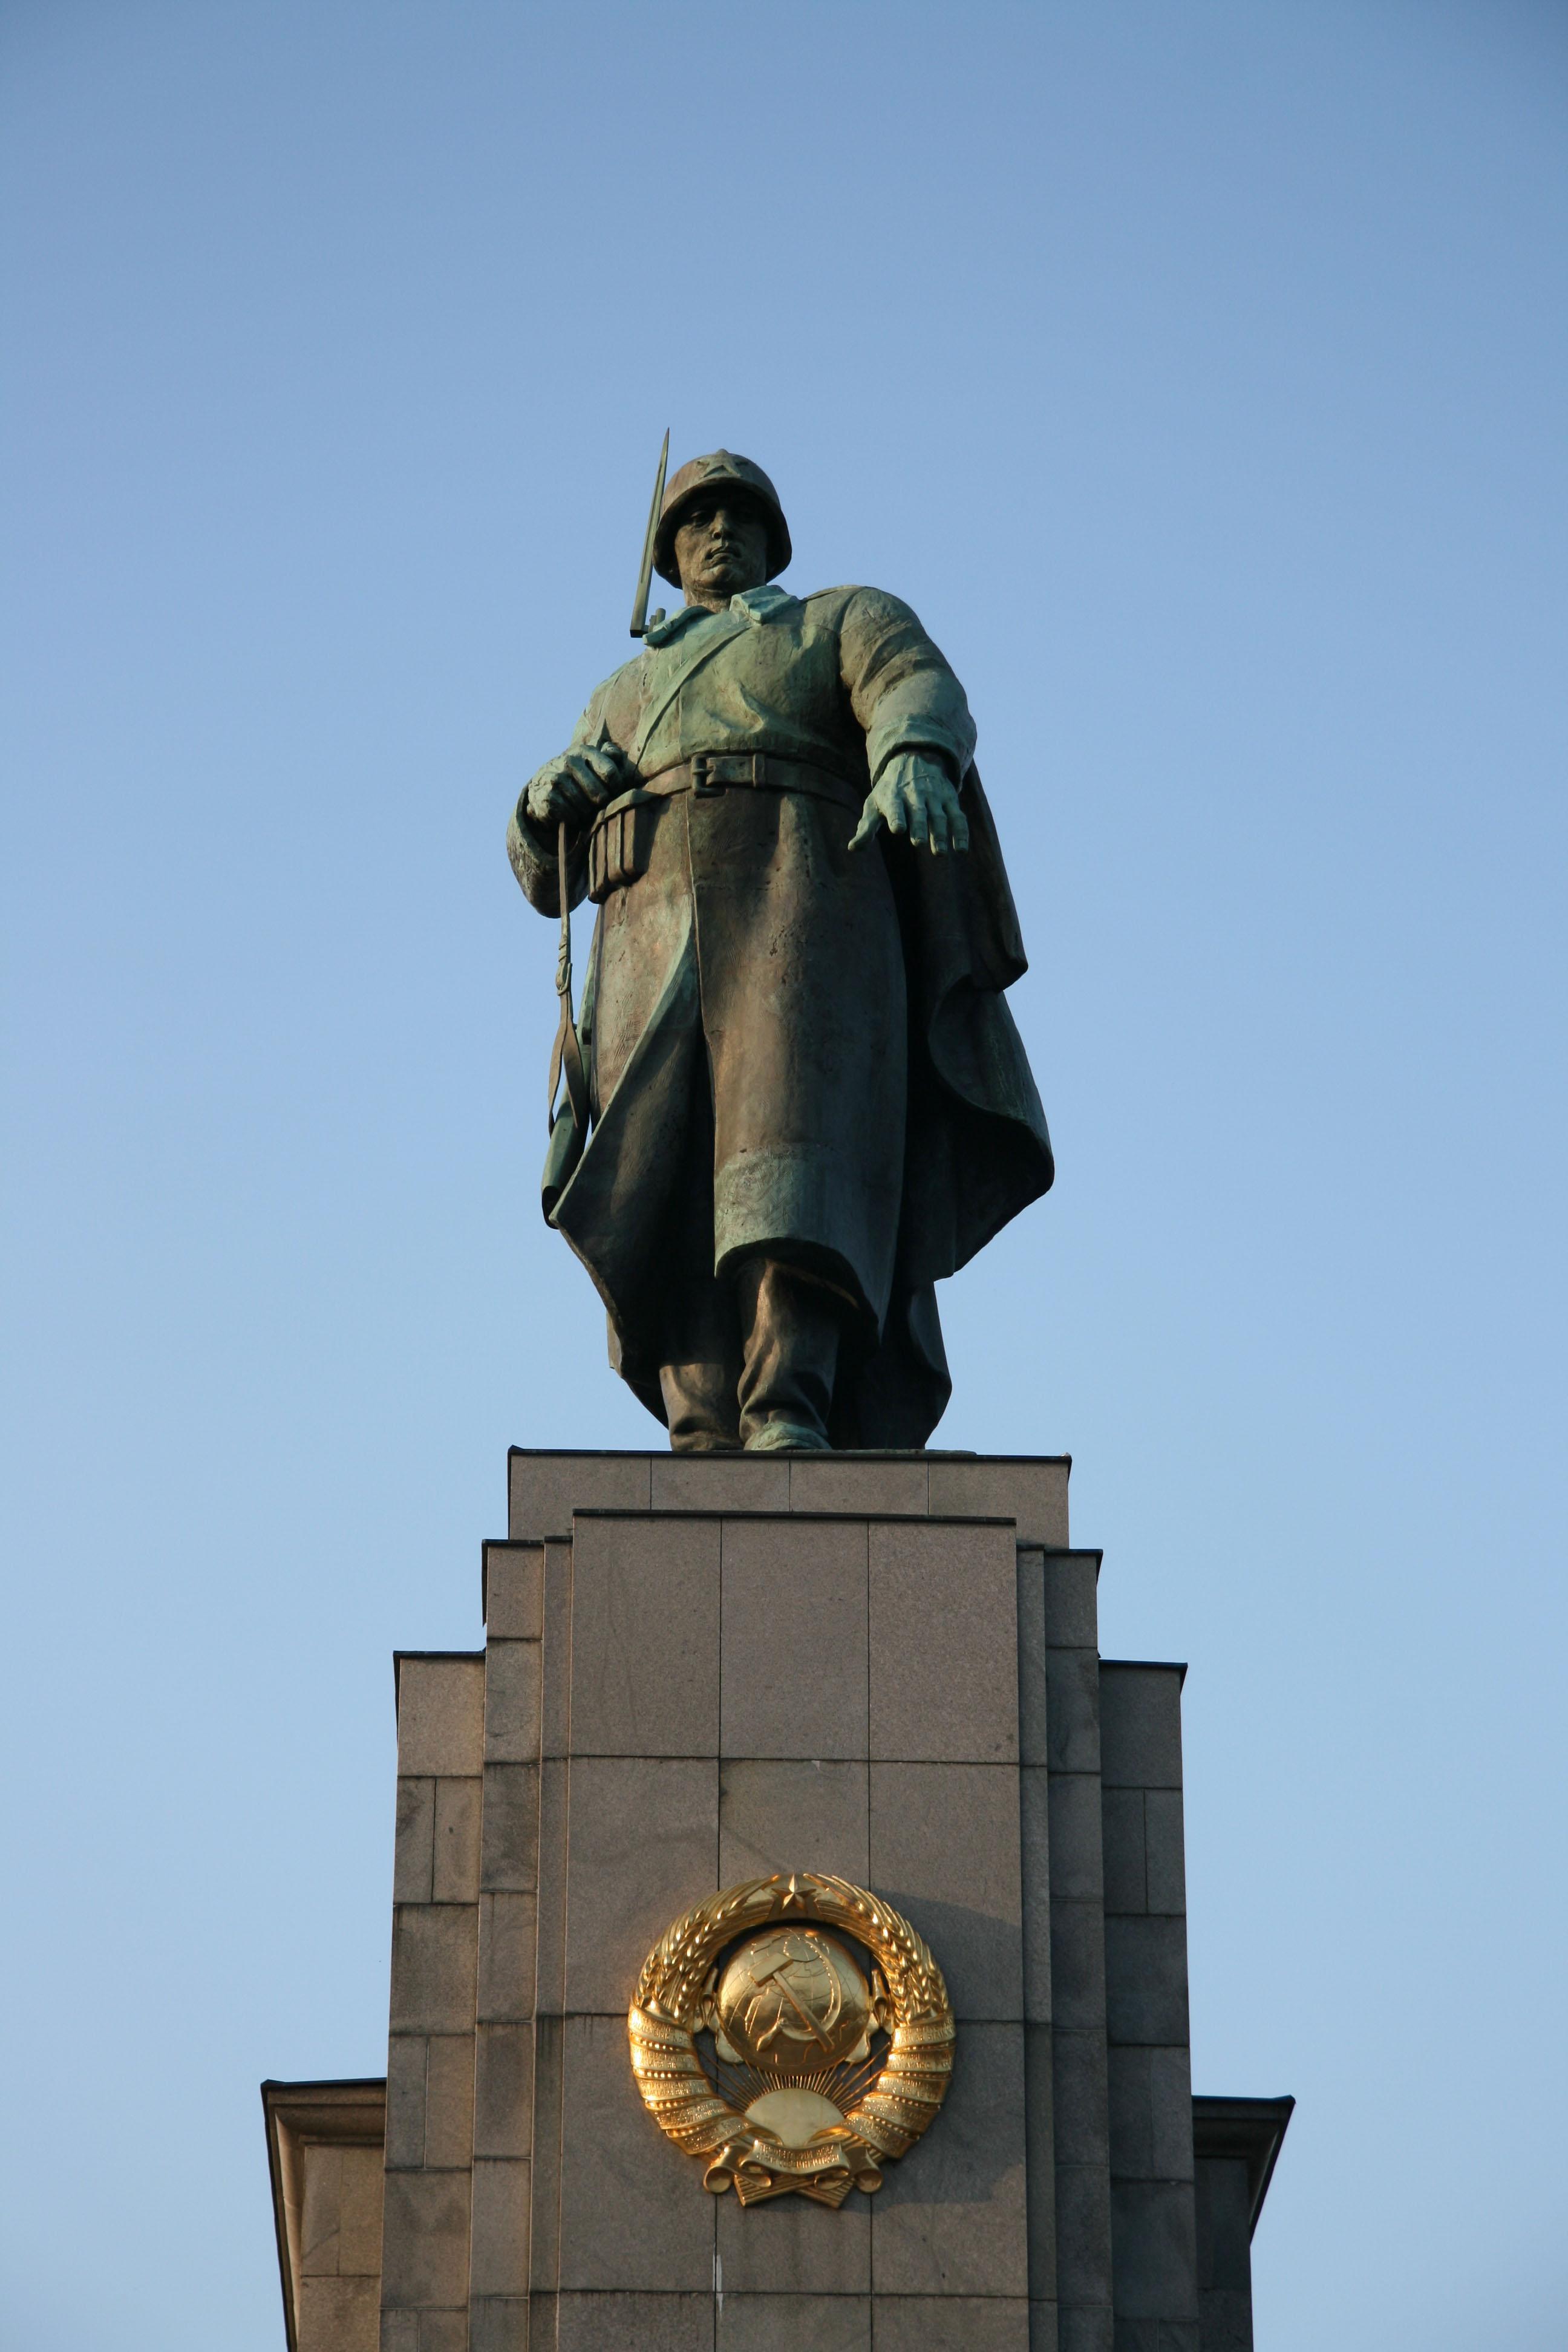 The soldier on the Soviet War Memorial on Strasse des 17 Juni in the Tiergarten in Berlin